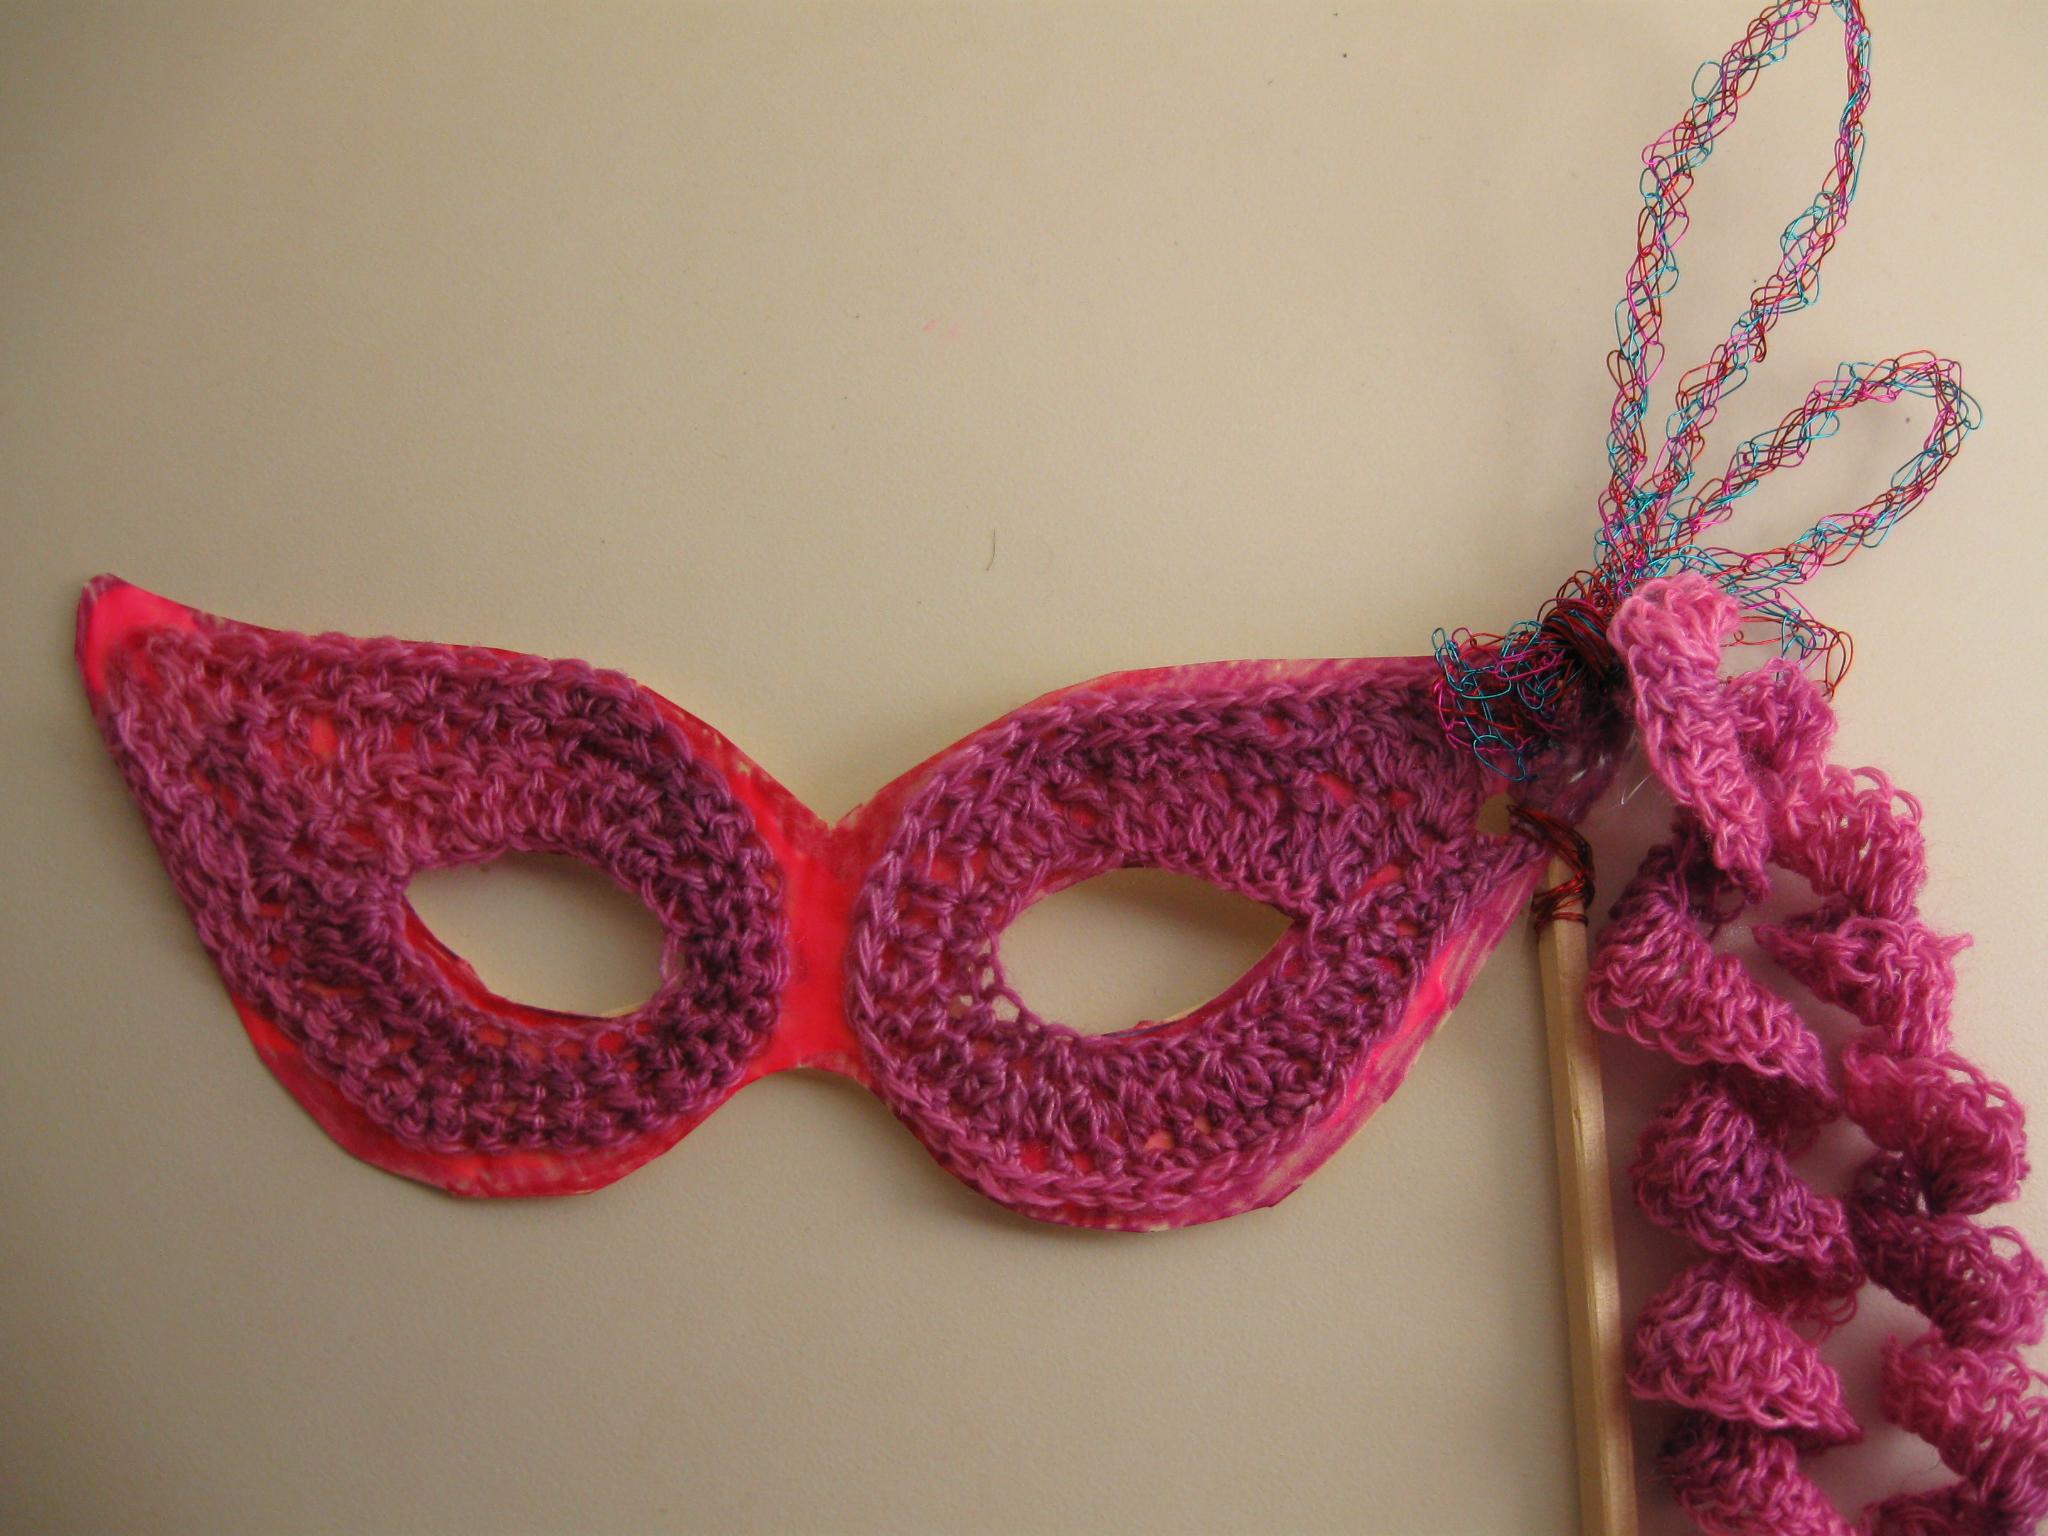 Tnna Minus Three Days And Counting Sharon Silverman Crochet